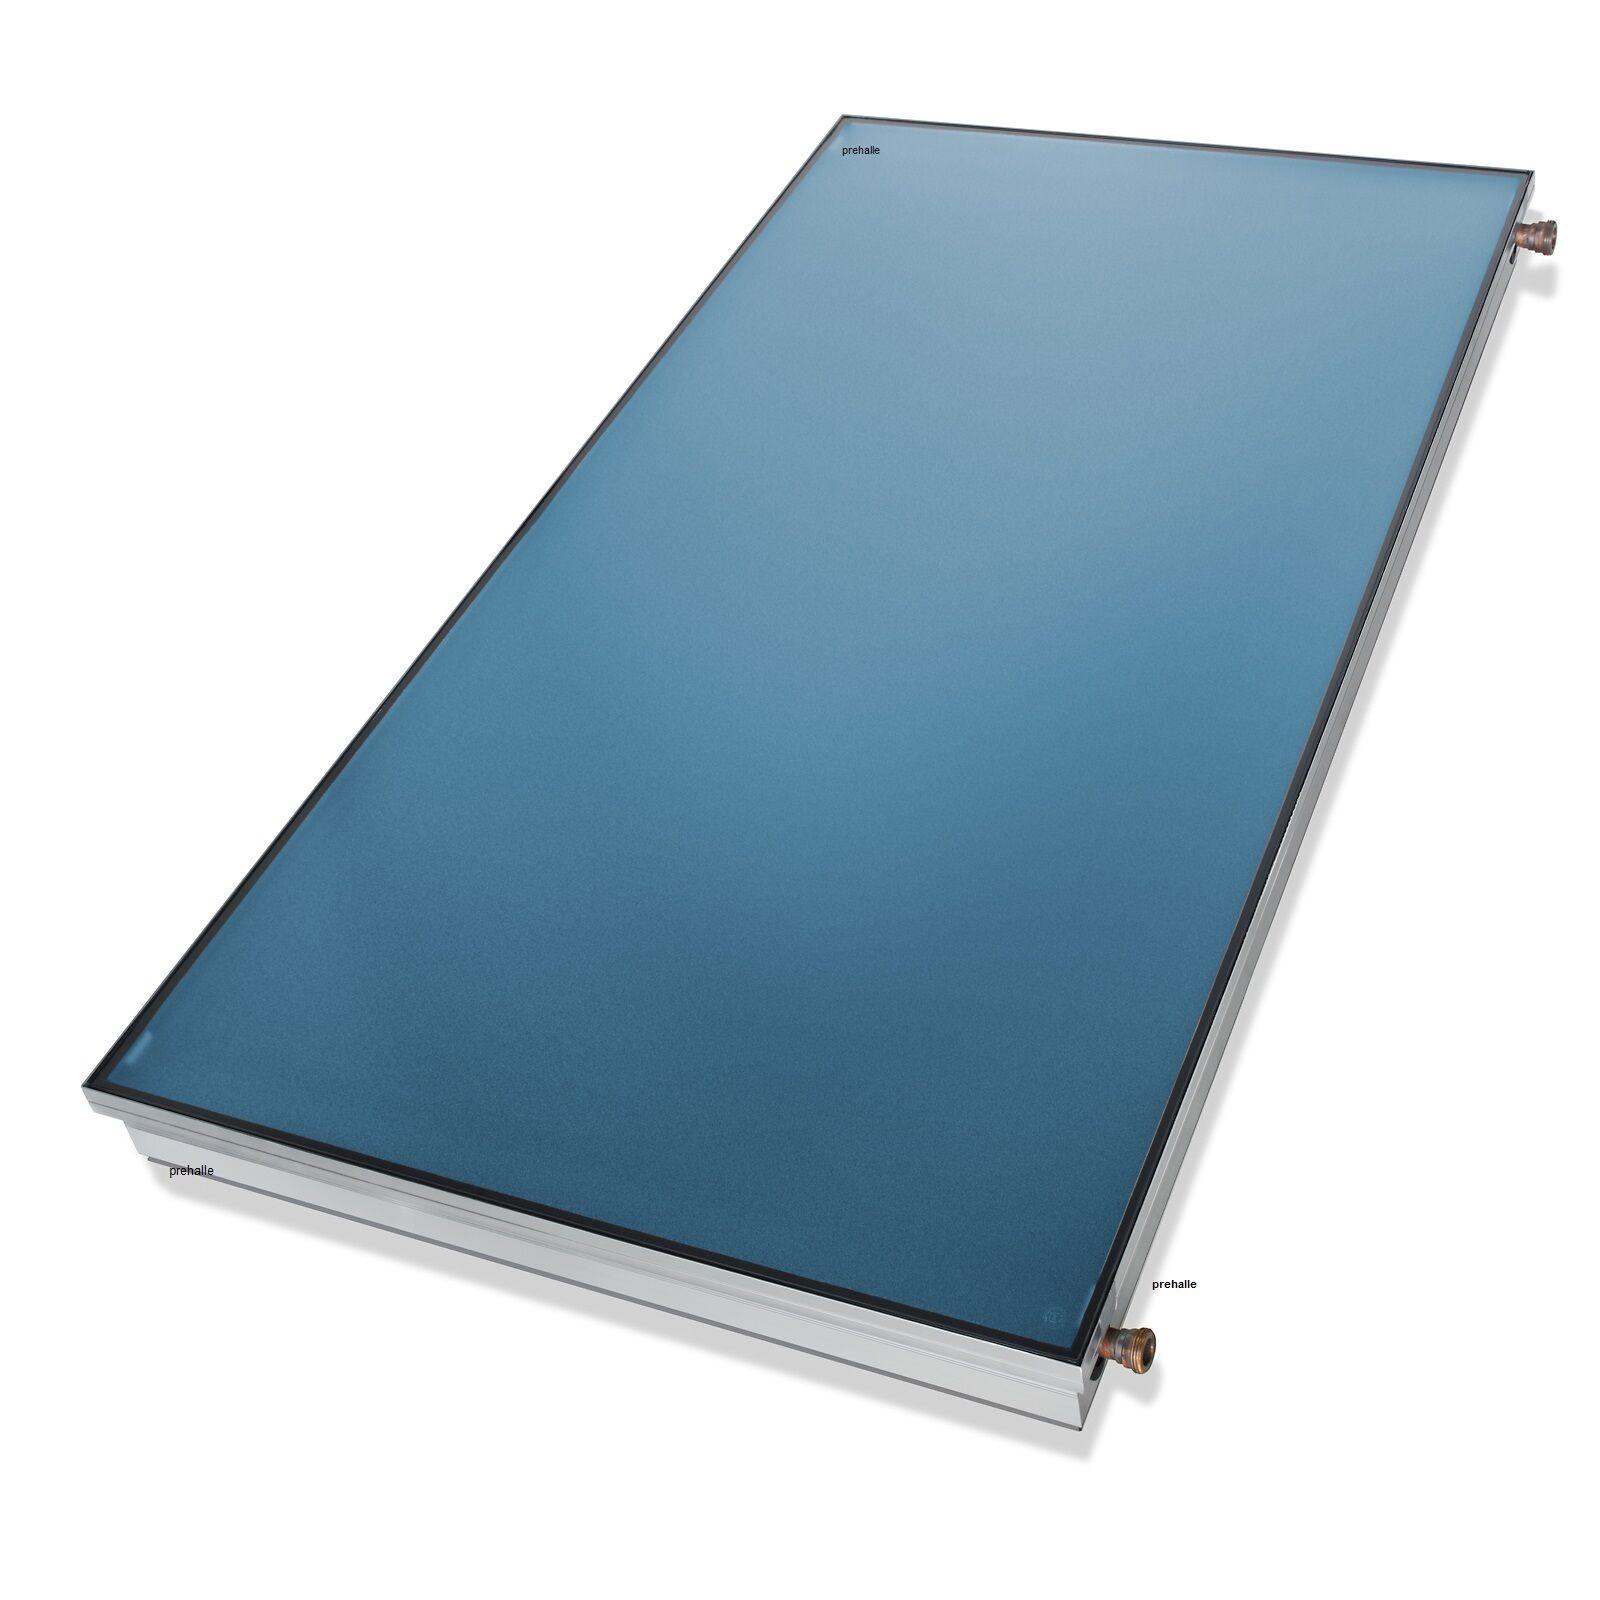 1A PRE 4,68m² Flachkollektor Solar Anlage + Solarflexrohr 5m (2in2) mit Dämmung